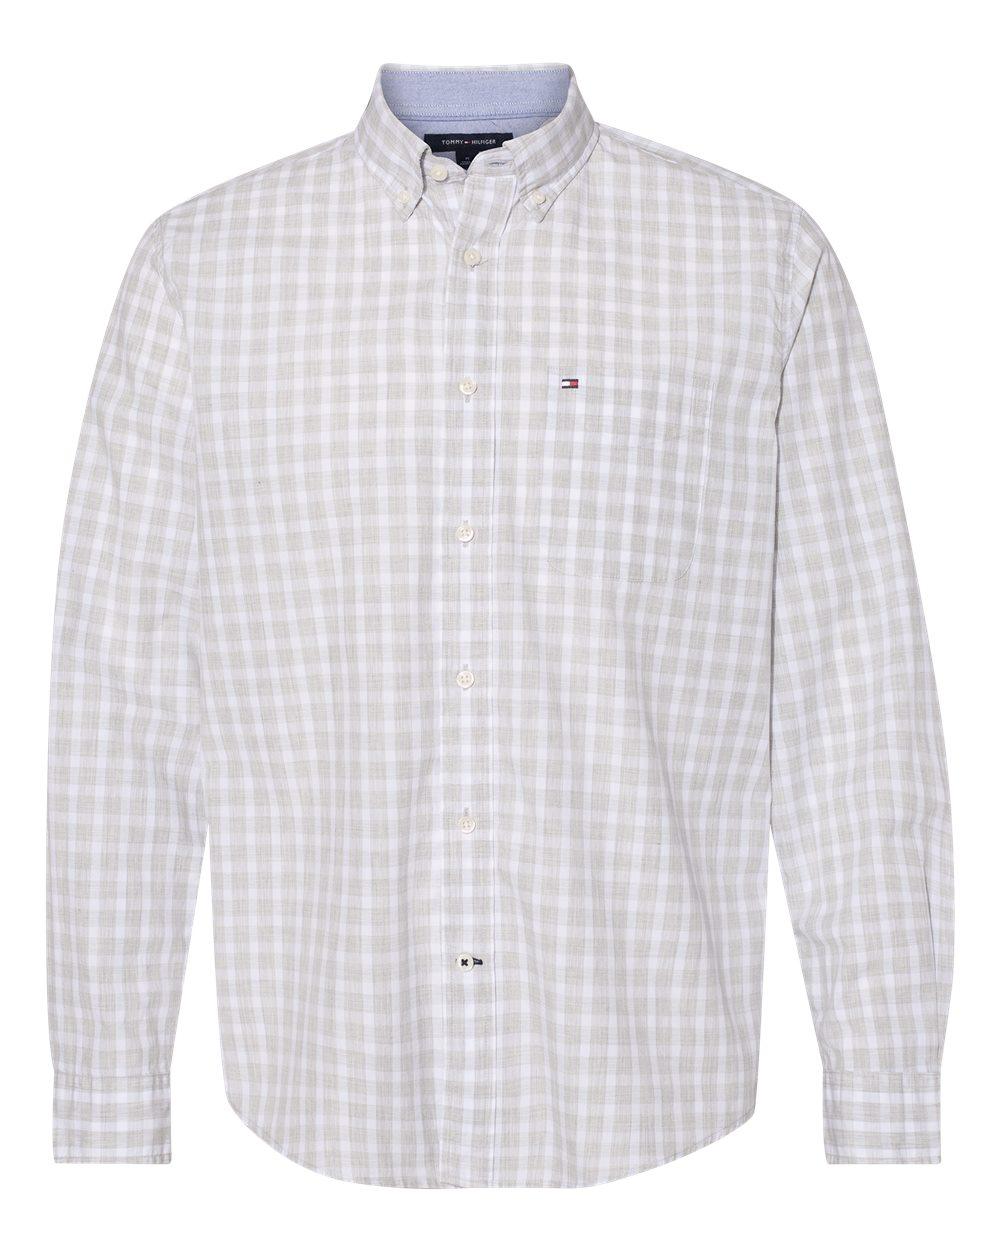 Tommy Hilfiger 13H1860 - Long Sleeve Plaid Shirt